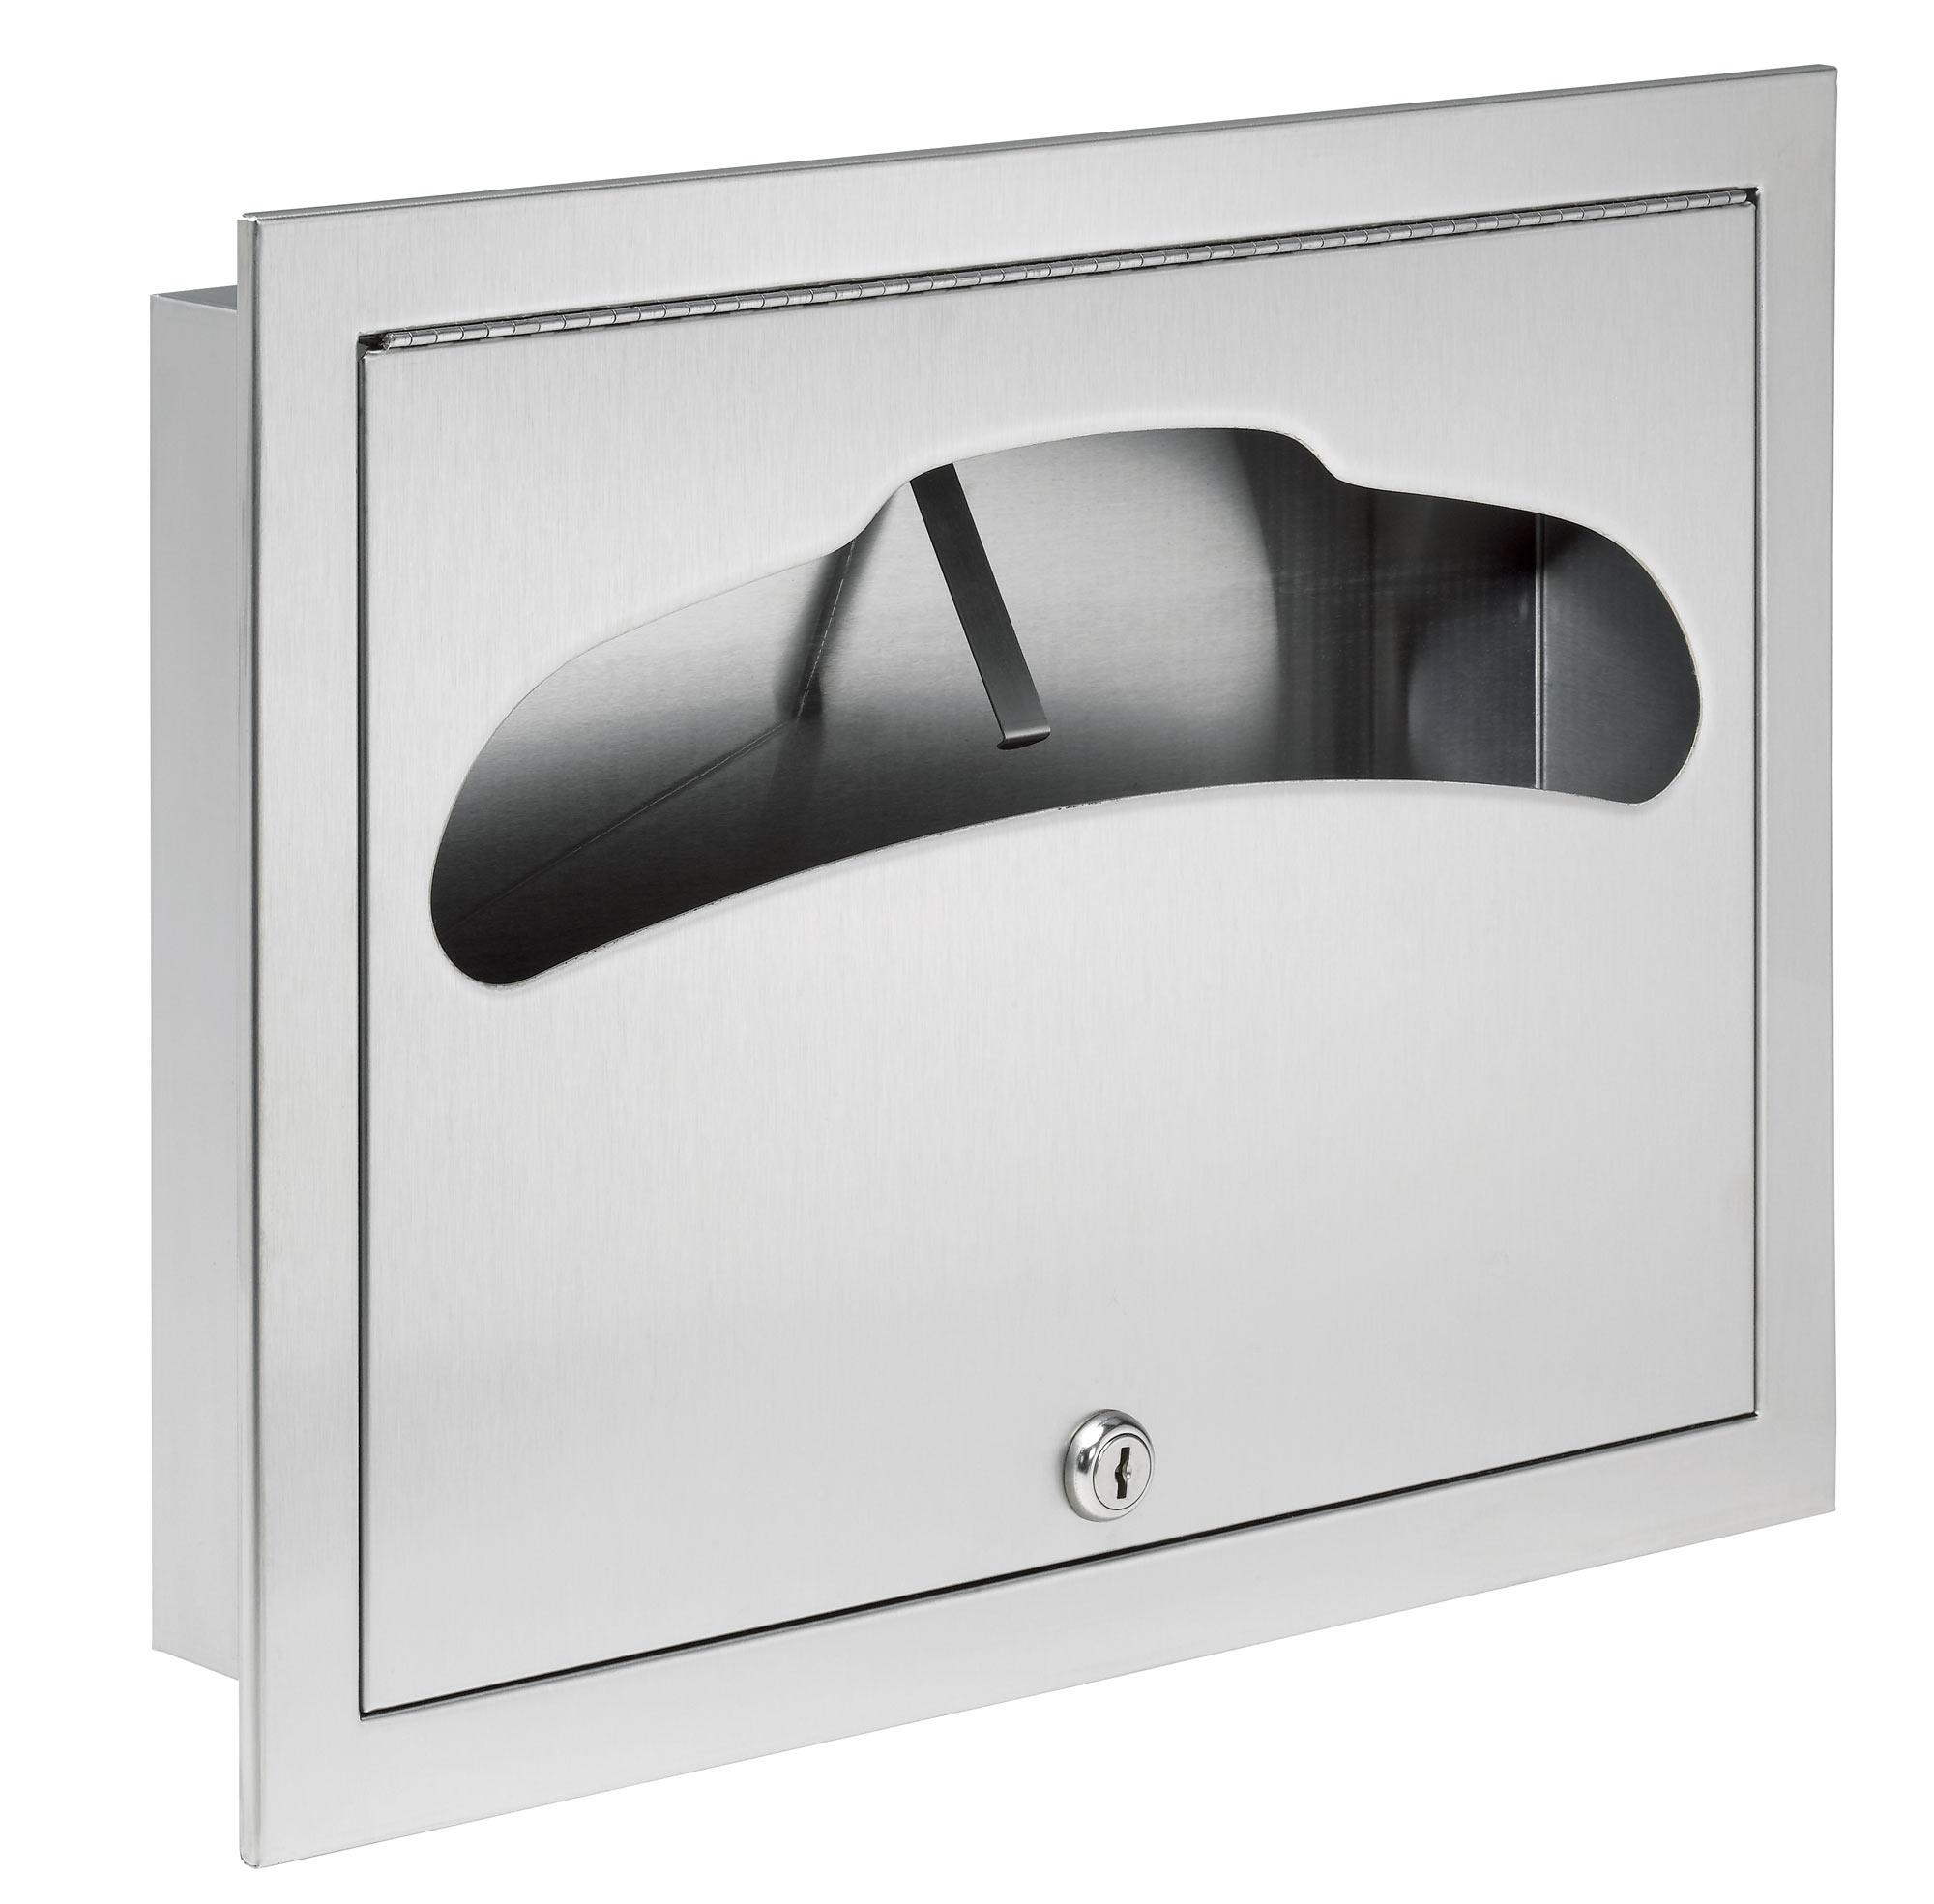 Bradley 584 Recessed Seat Cover Dispenser